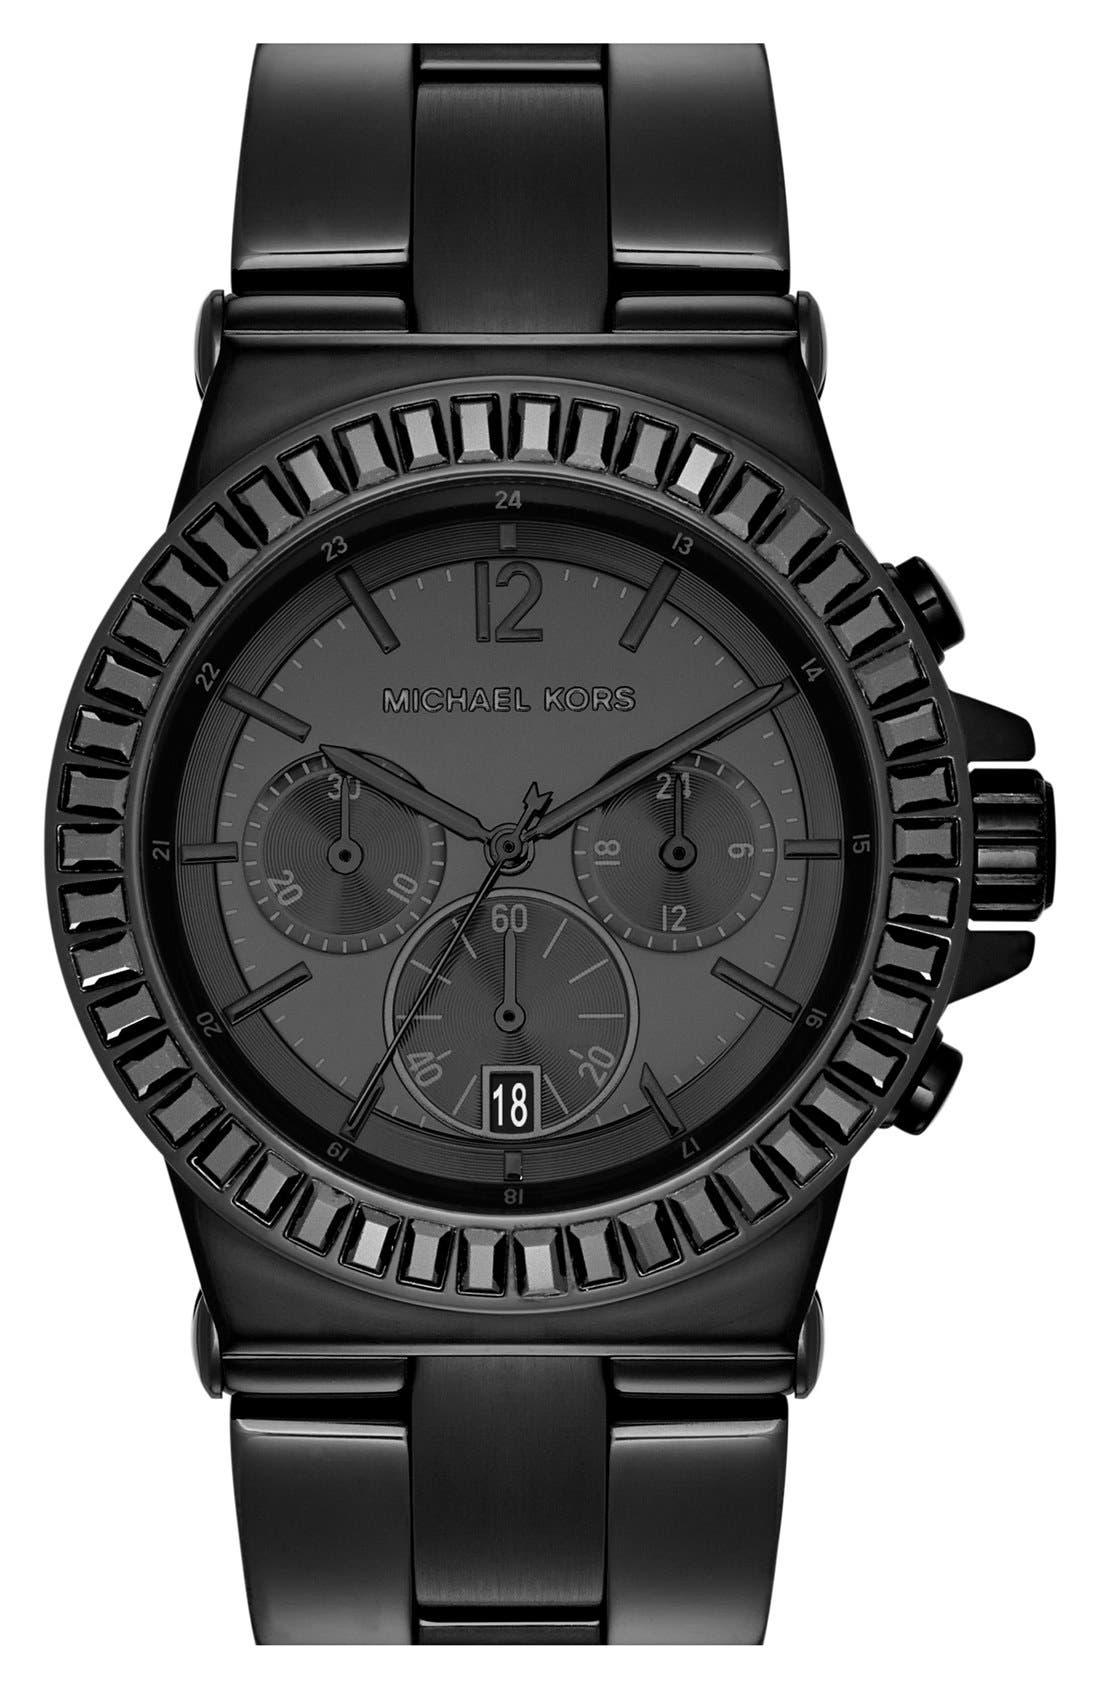 Main Image - Michael Kors 'Dylan' Crystal Bezel Chronograph Watch, 43mm